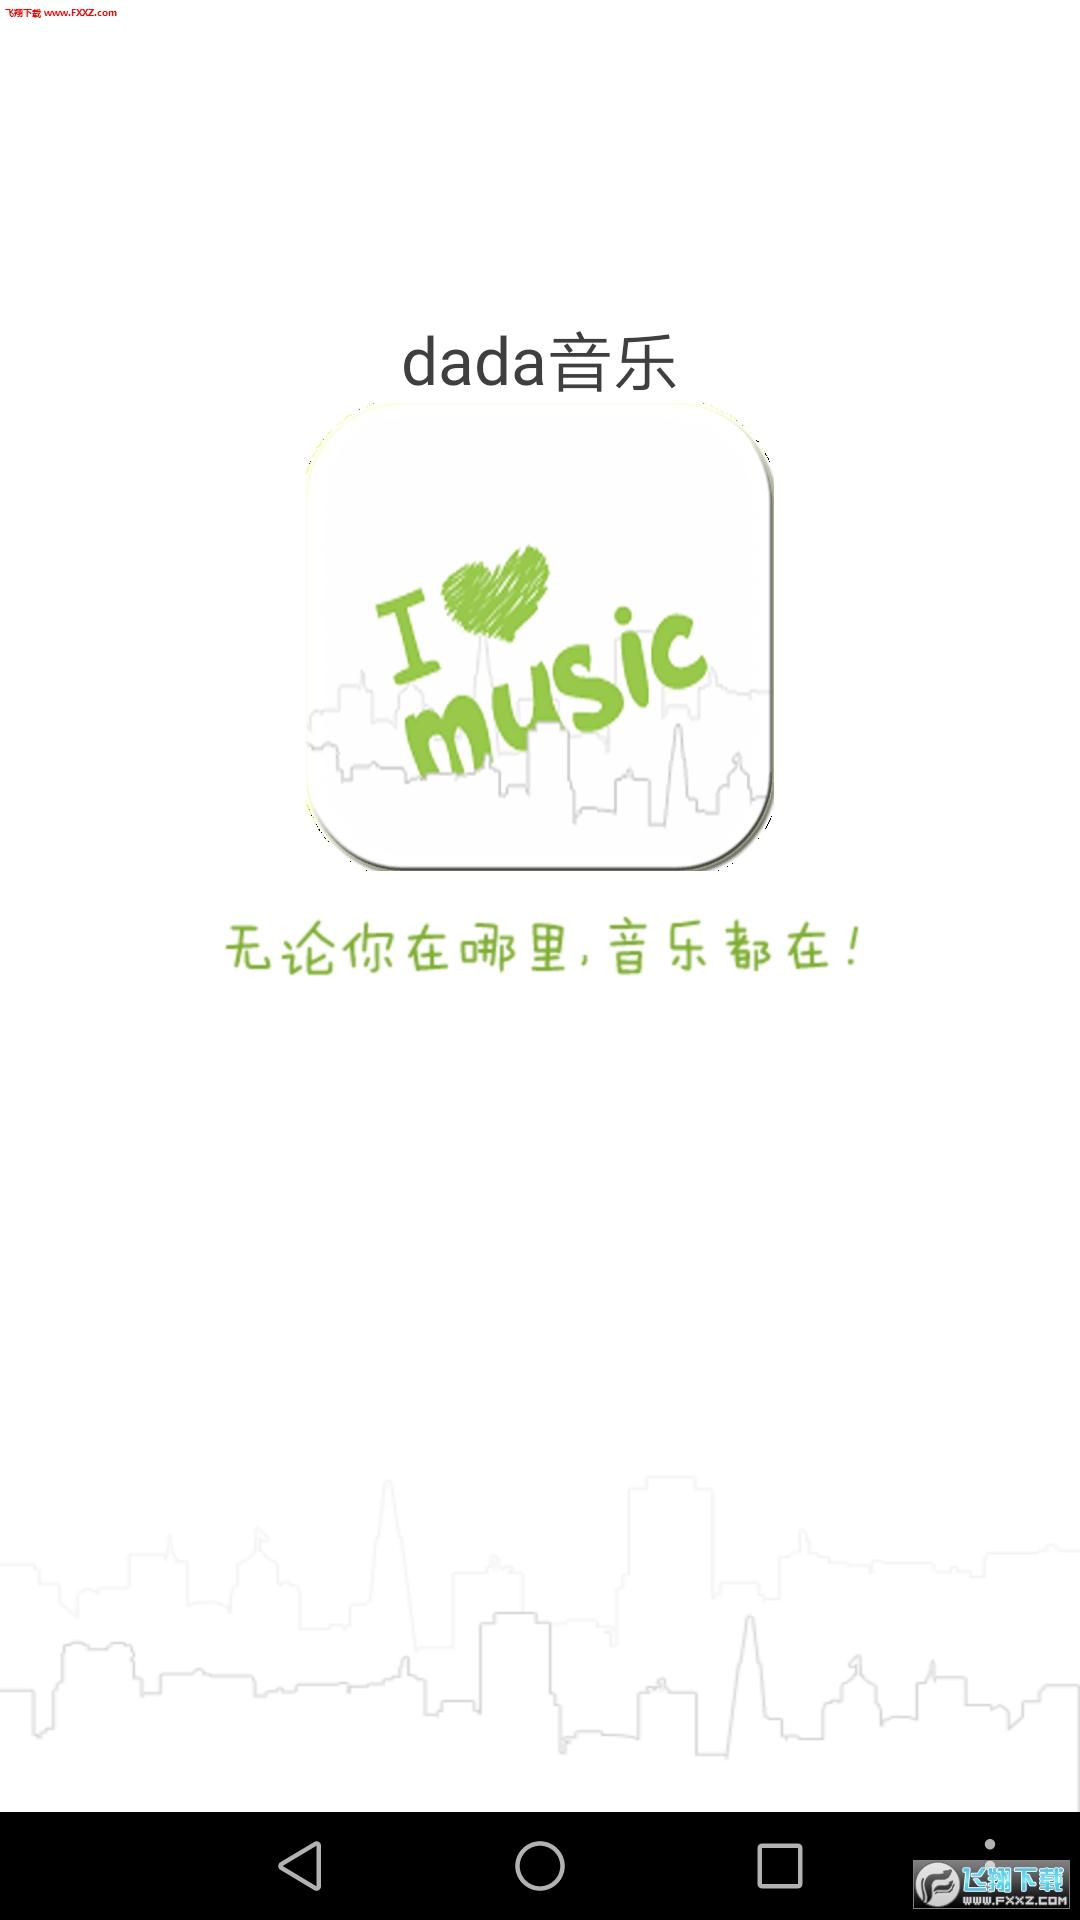 dada音乐app安卓版v1.1截图0